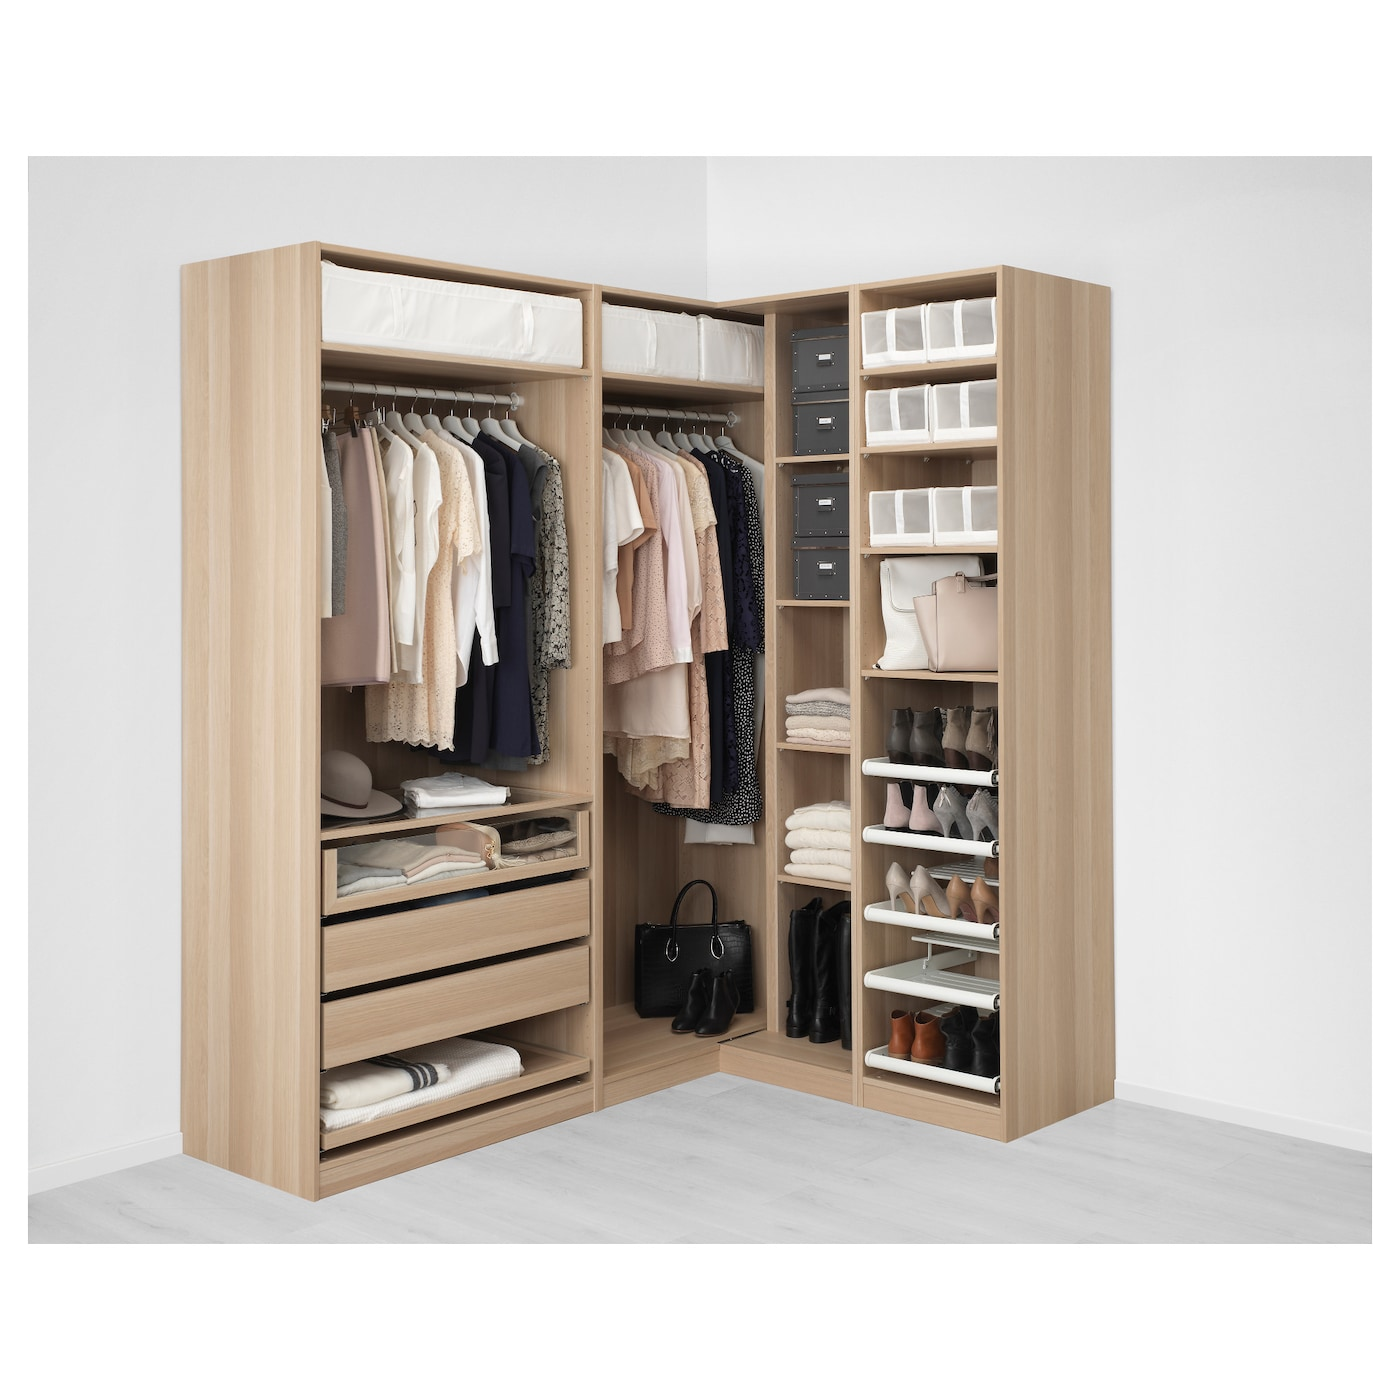 pax armario esquina efecto roble tinte blanco nexus vikedal 210 160 x 236 cm ikea. Black Bedroom Furniture Sets. Home Design Ideas